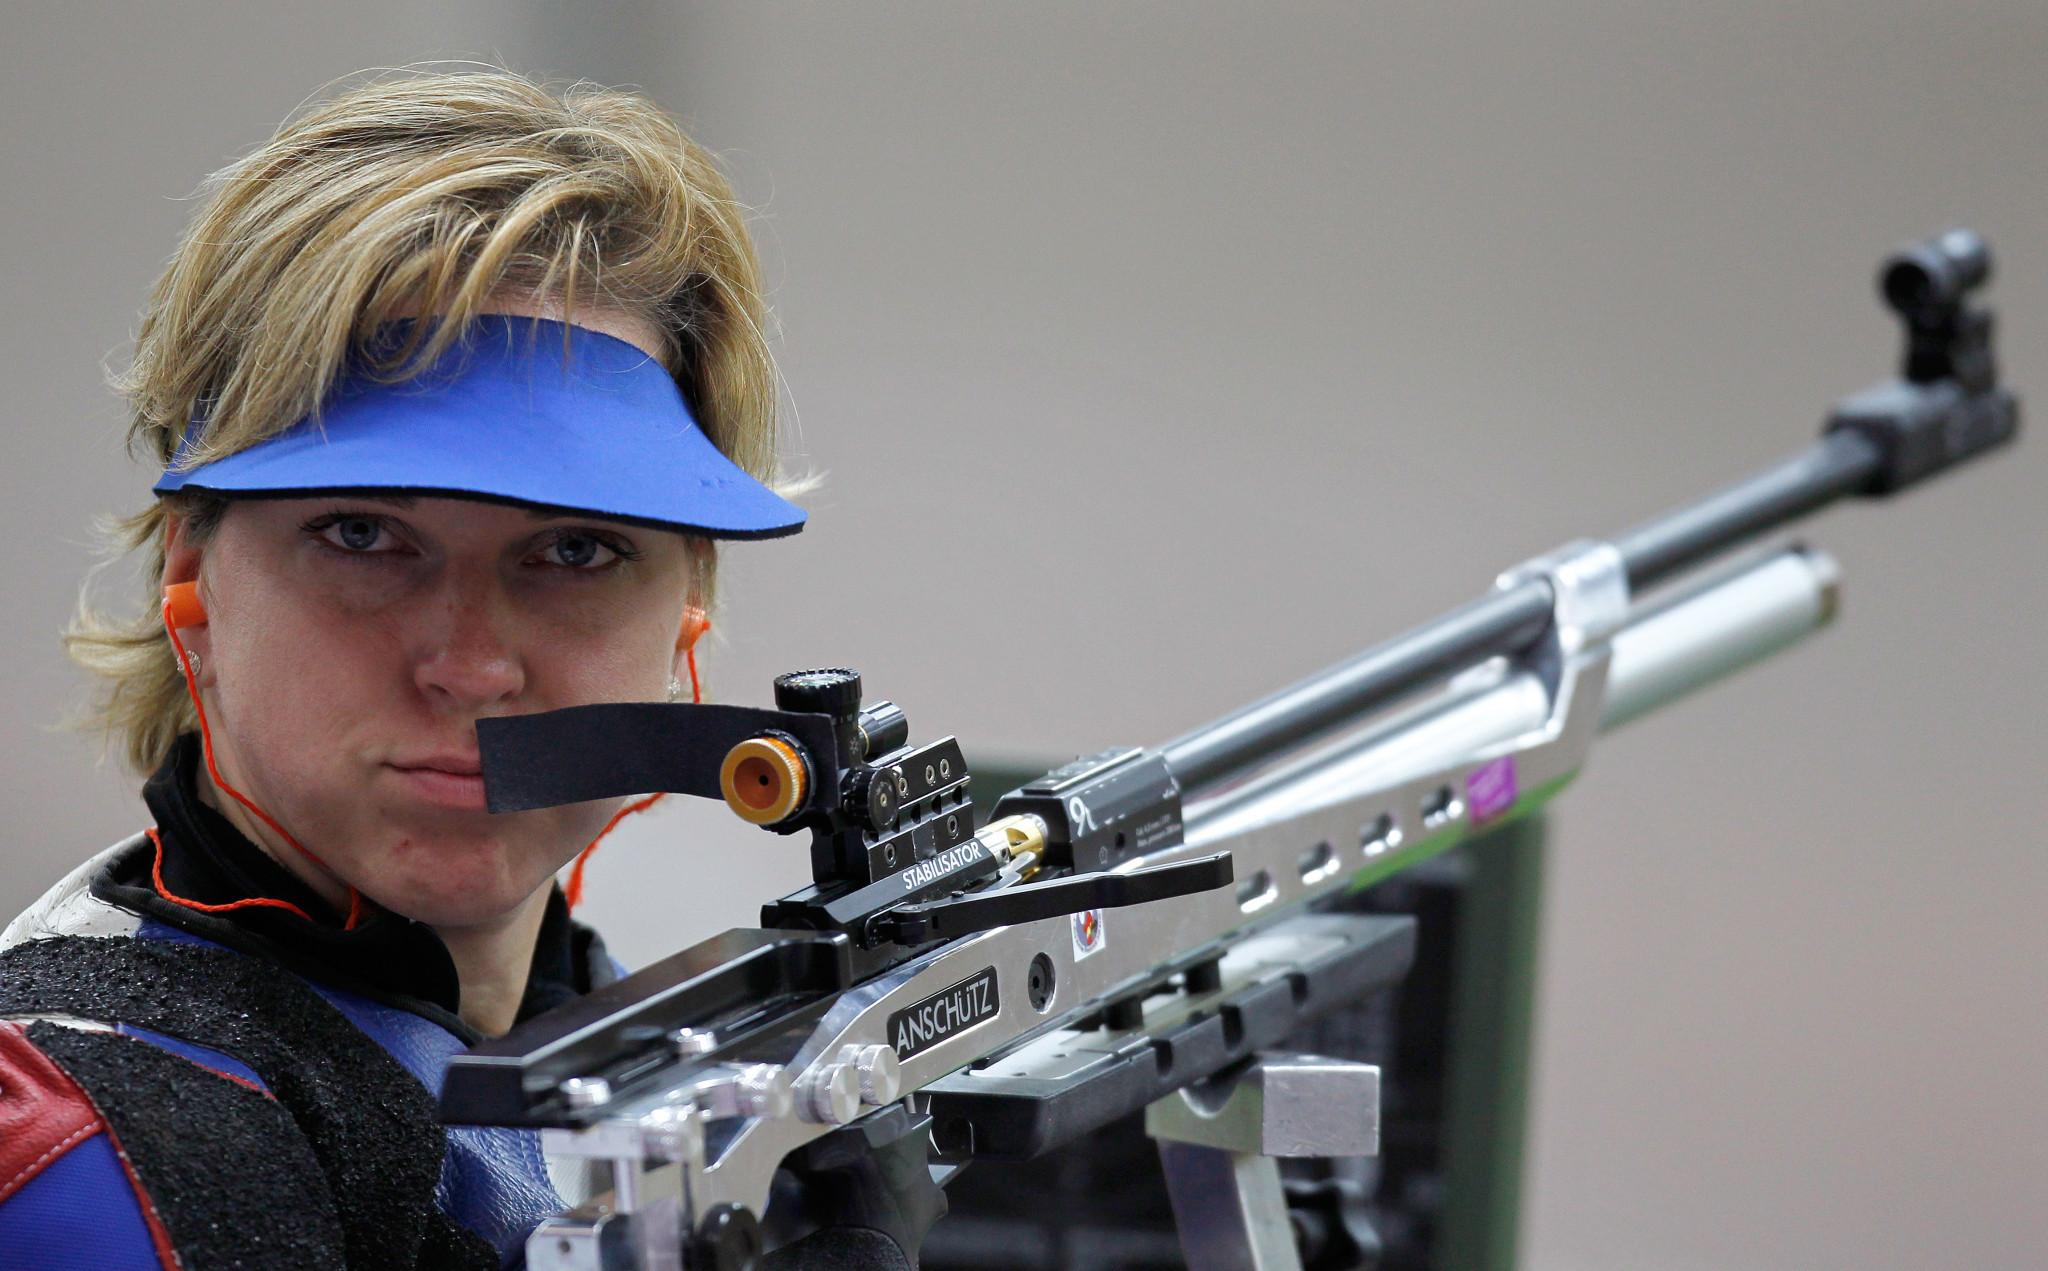 World record for Rio 2016 champion Vadovičová at World Shooting Para Sport Championships